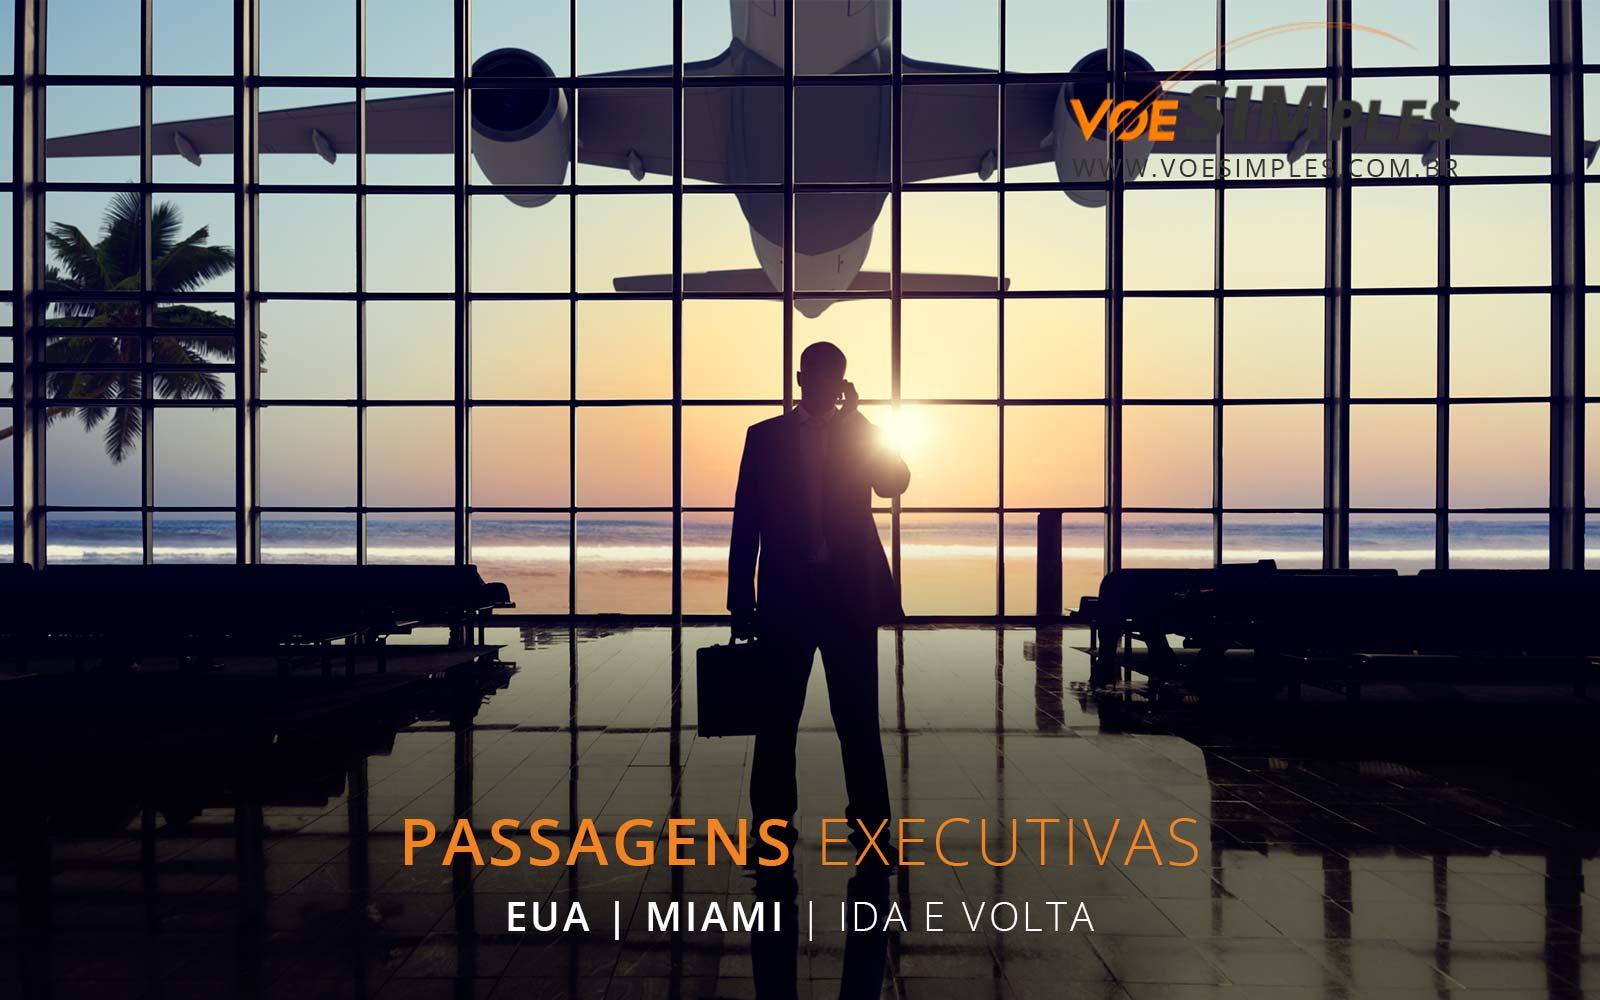 passagem aérea Classe Executiva Avianca, Combo e Taca para Miami